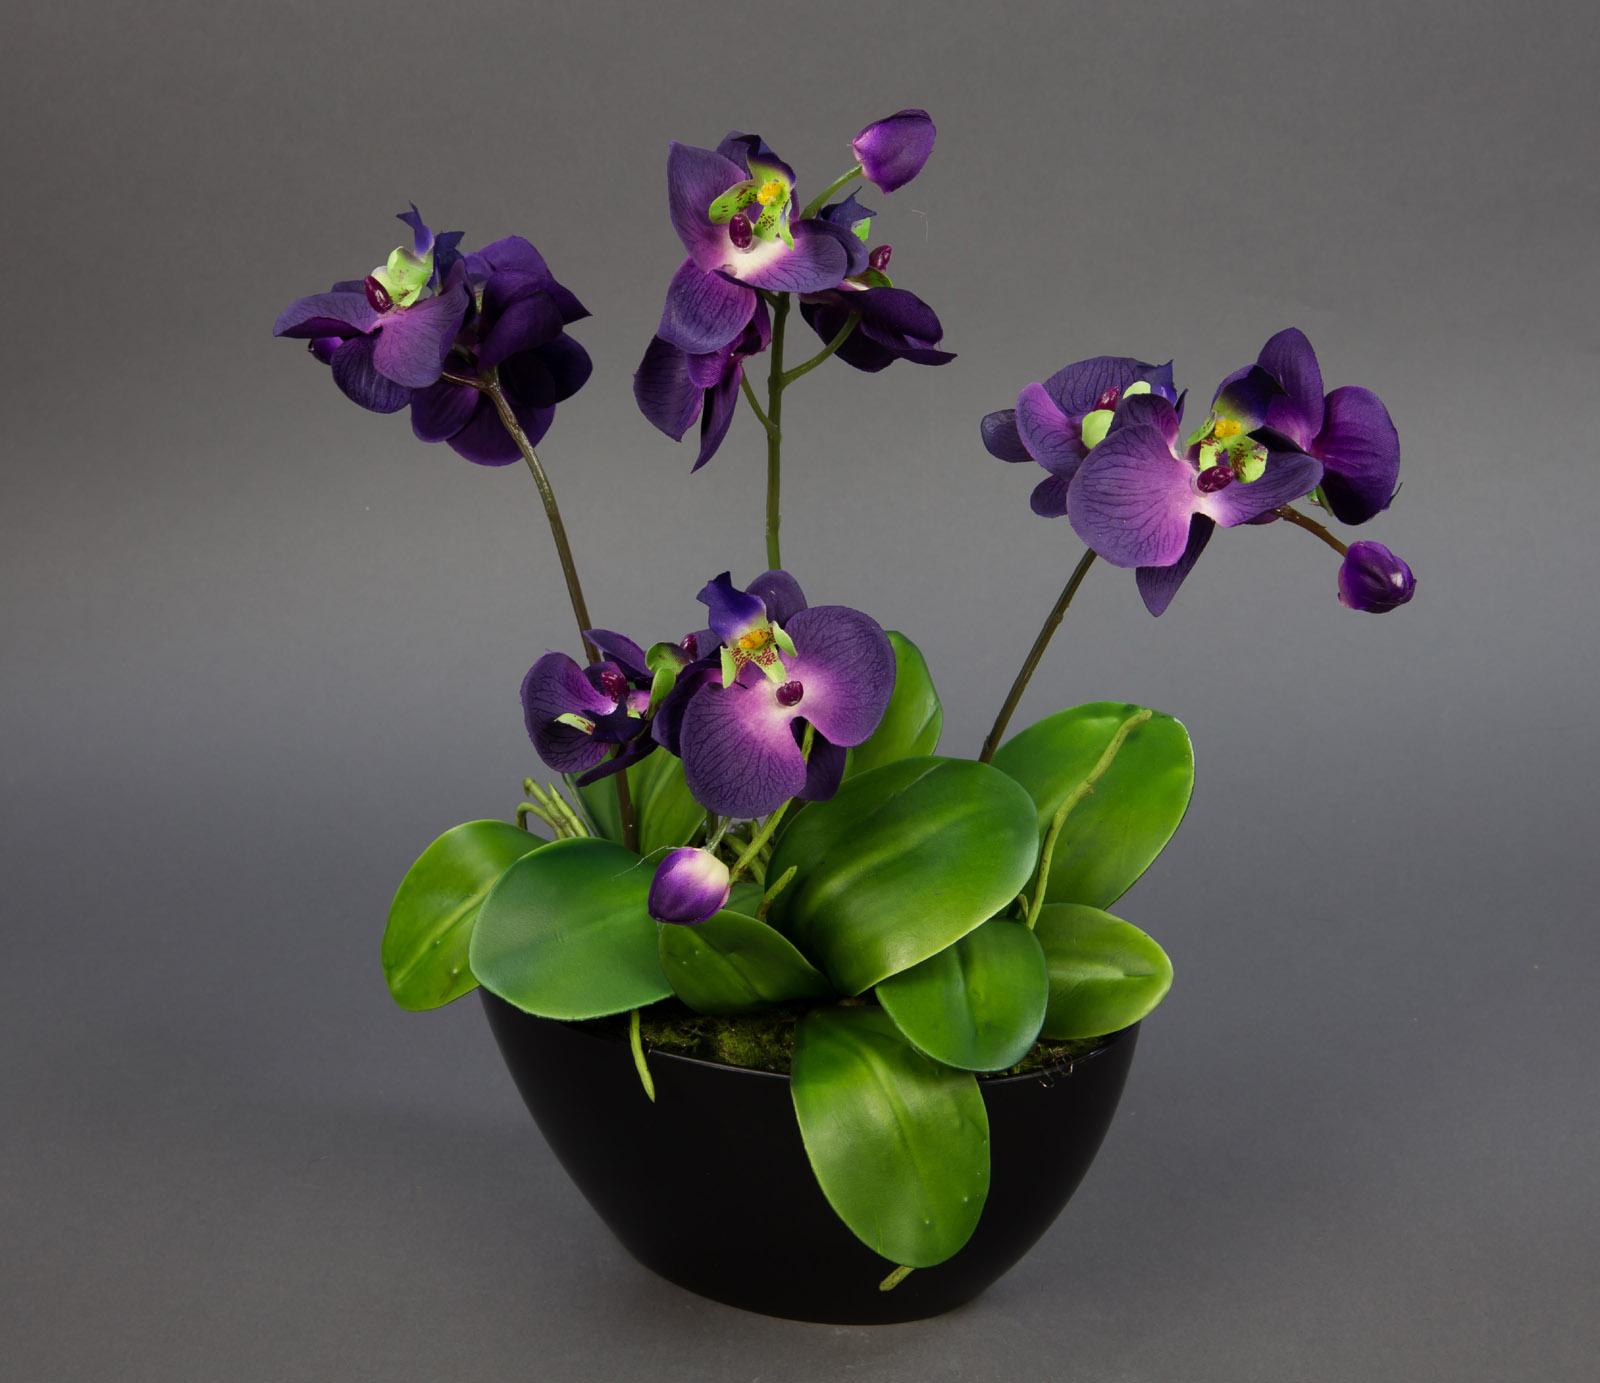 Orchideen arrangement 38x36cm lila in schwarzer dekoschale ga kunstblumen ebay - Orchideen arrangement ...